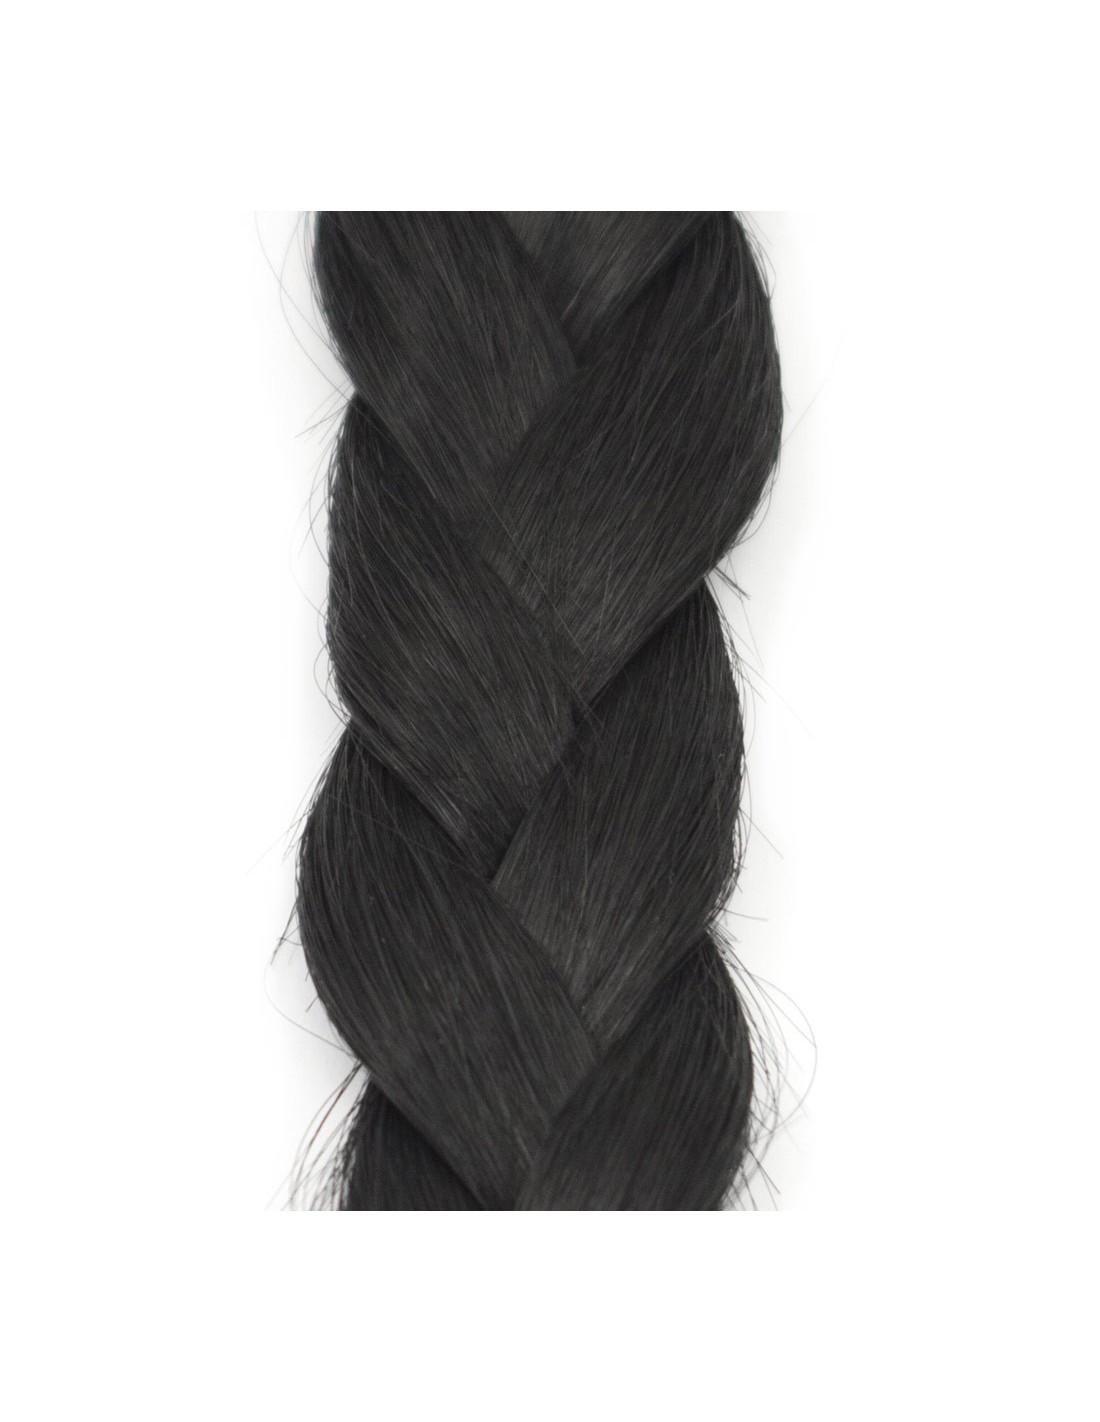 xxxl k ratine 1gr extension chaud 70 cm extens hair. Black Bedroom Furniture Sets. Home Design Ideas